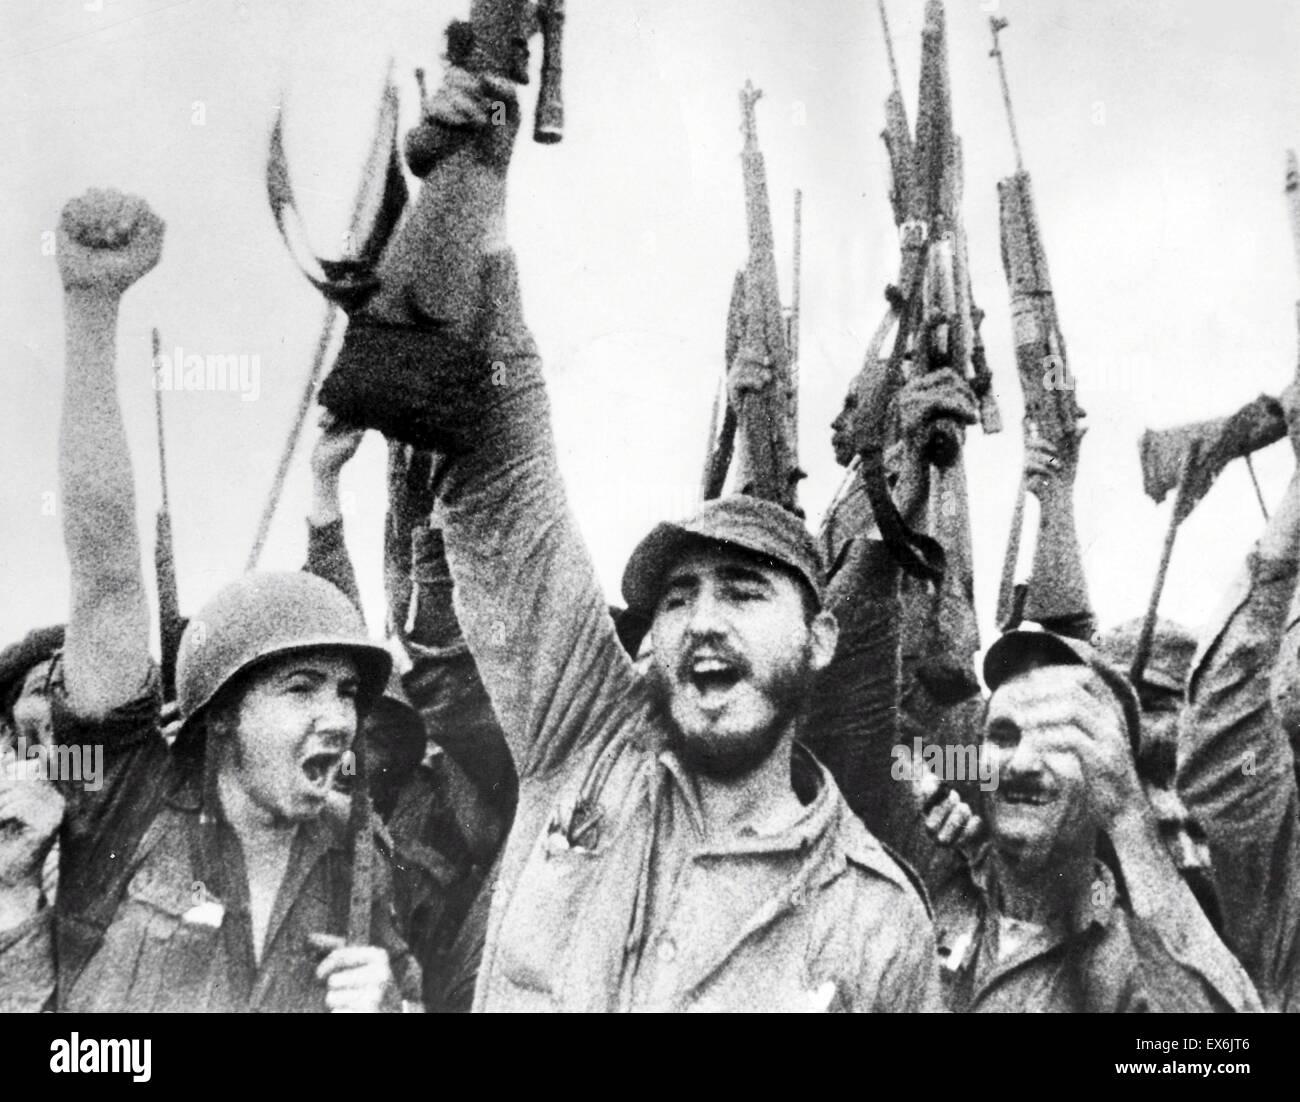 Fidel Castro with fellow revolutionary rebels in Cuba 1959 - Stock Image